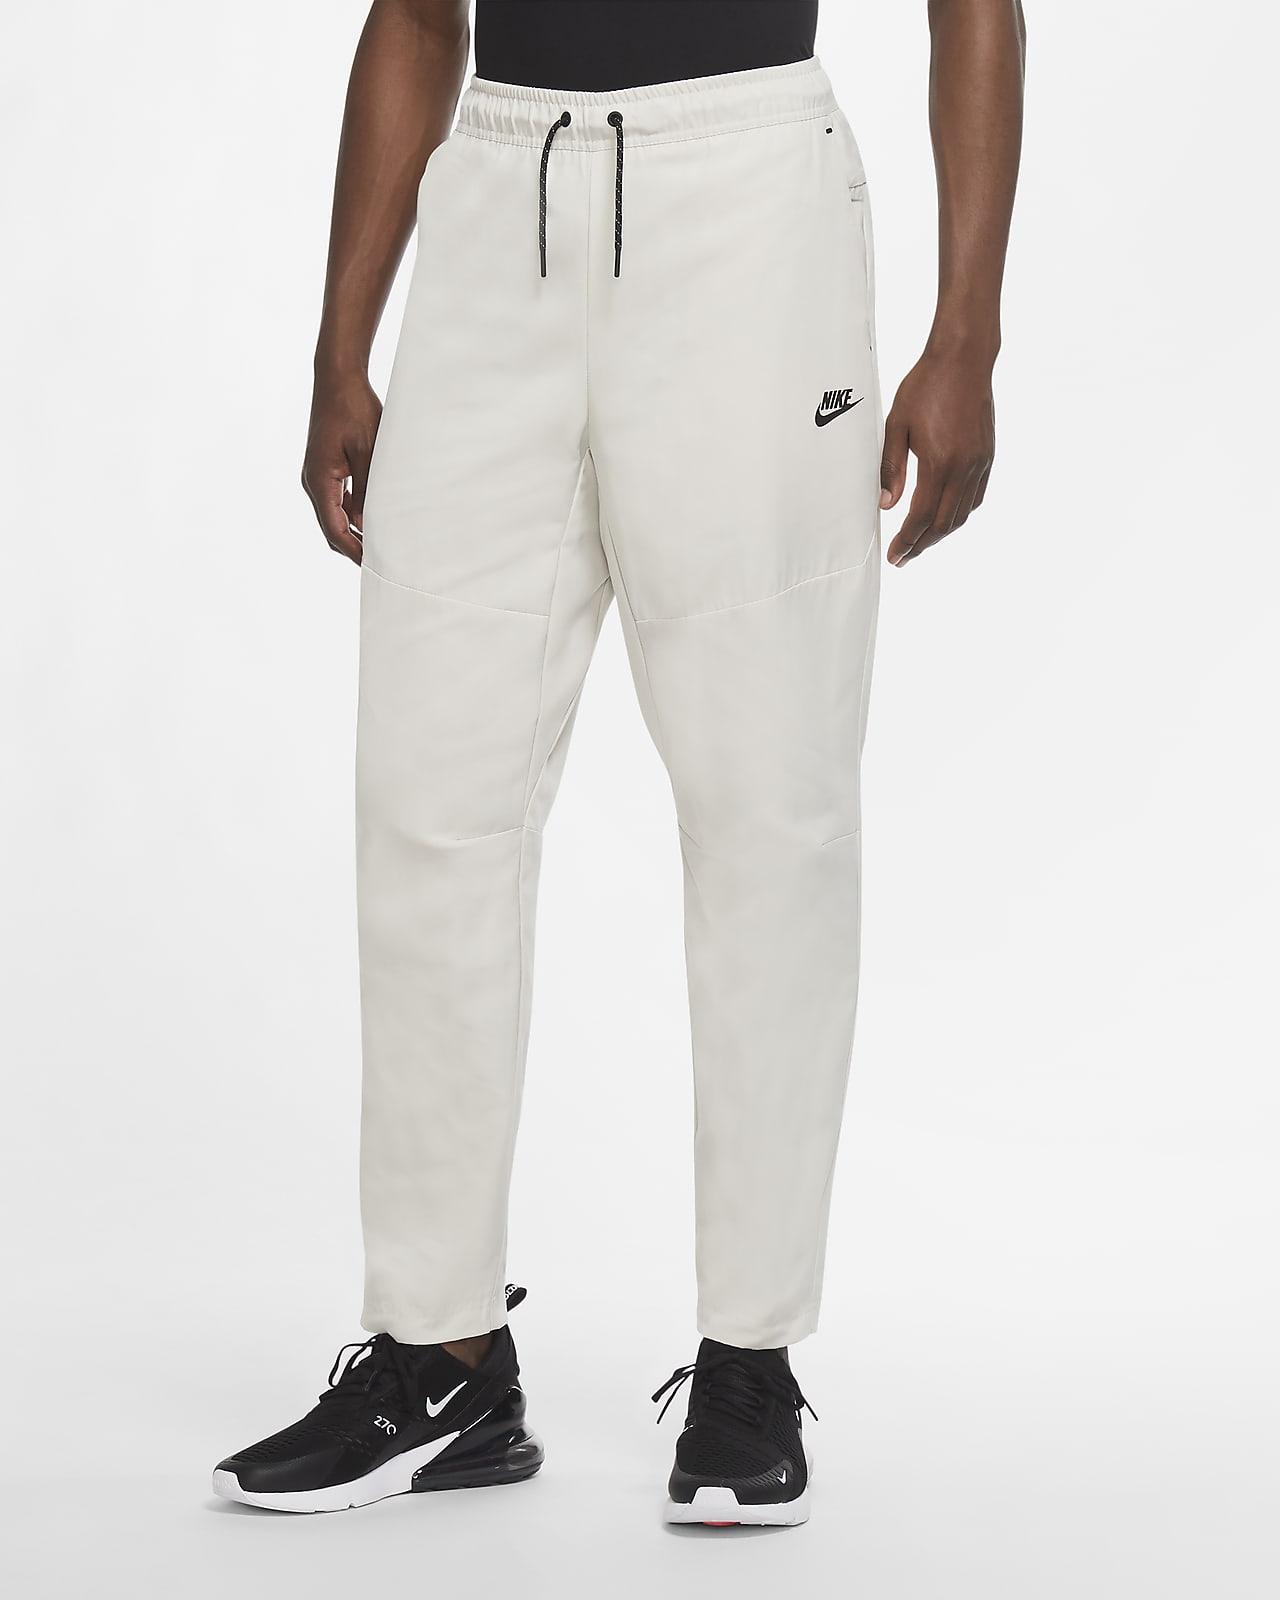 Pantaloni Repel Nike Sportswear Tech Essentials - Uomo